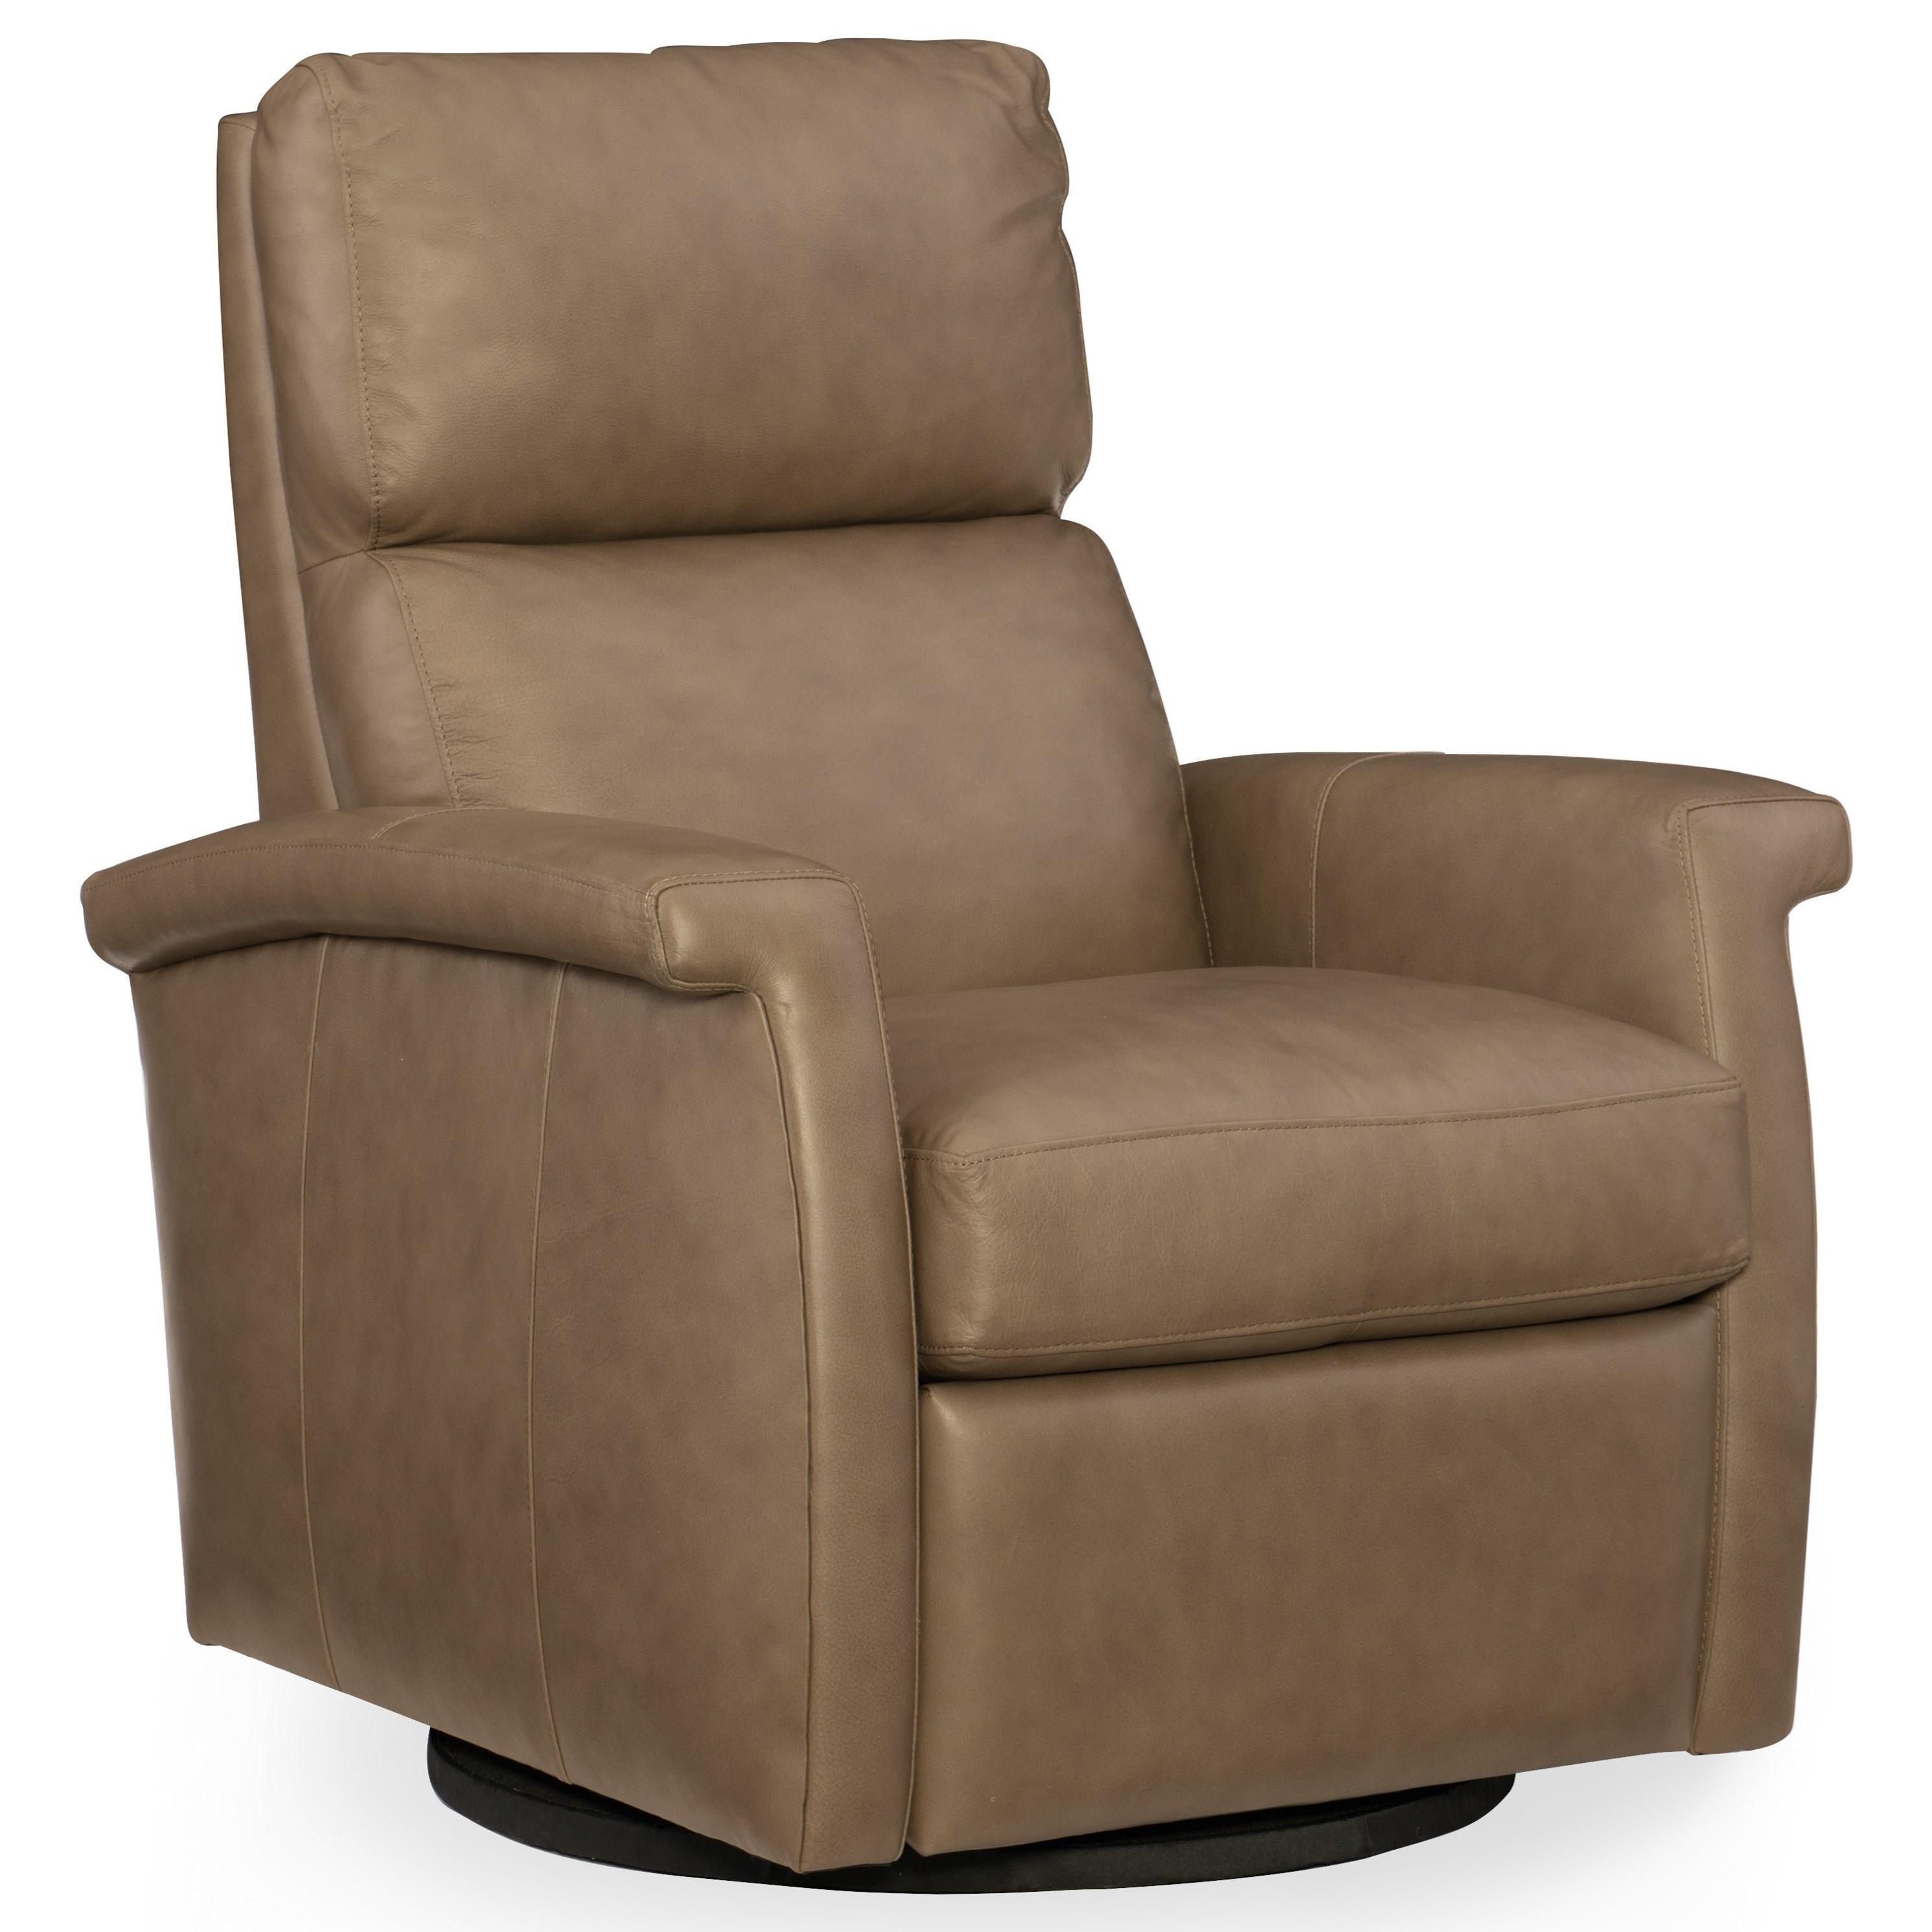 Hooker Furniture Reclining Chairs Rosalie Swivel Recliner